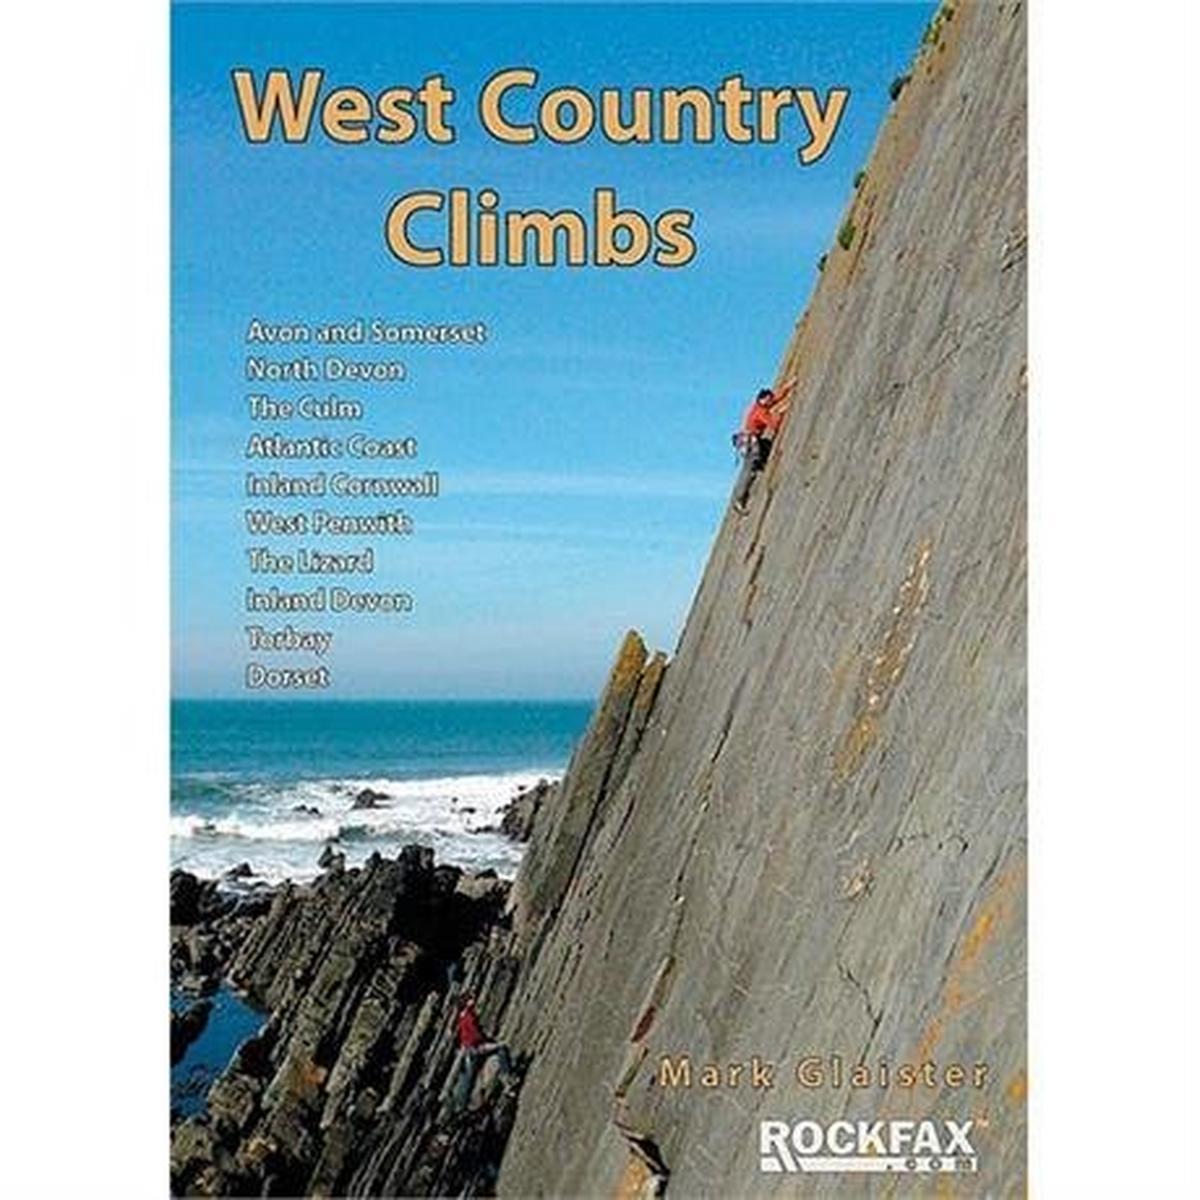 Rockfax Climbing Guide Book: West Country Climbs